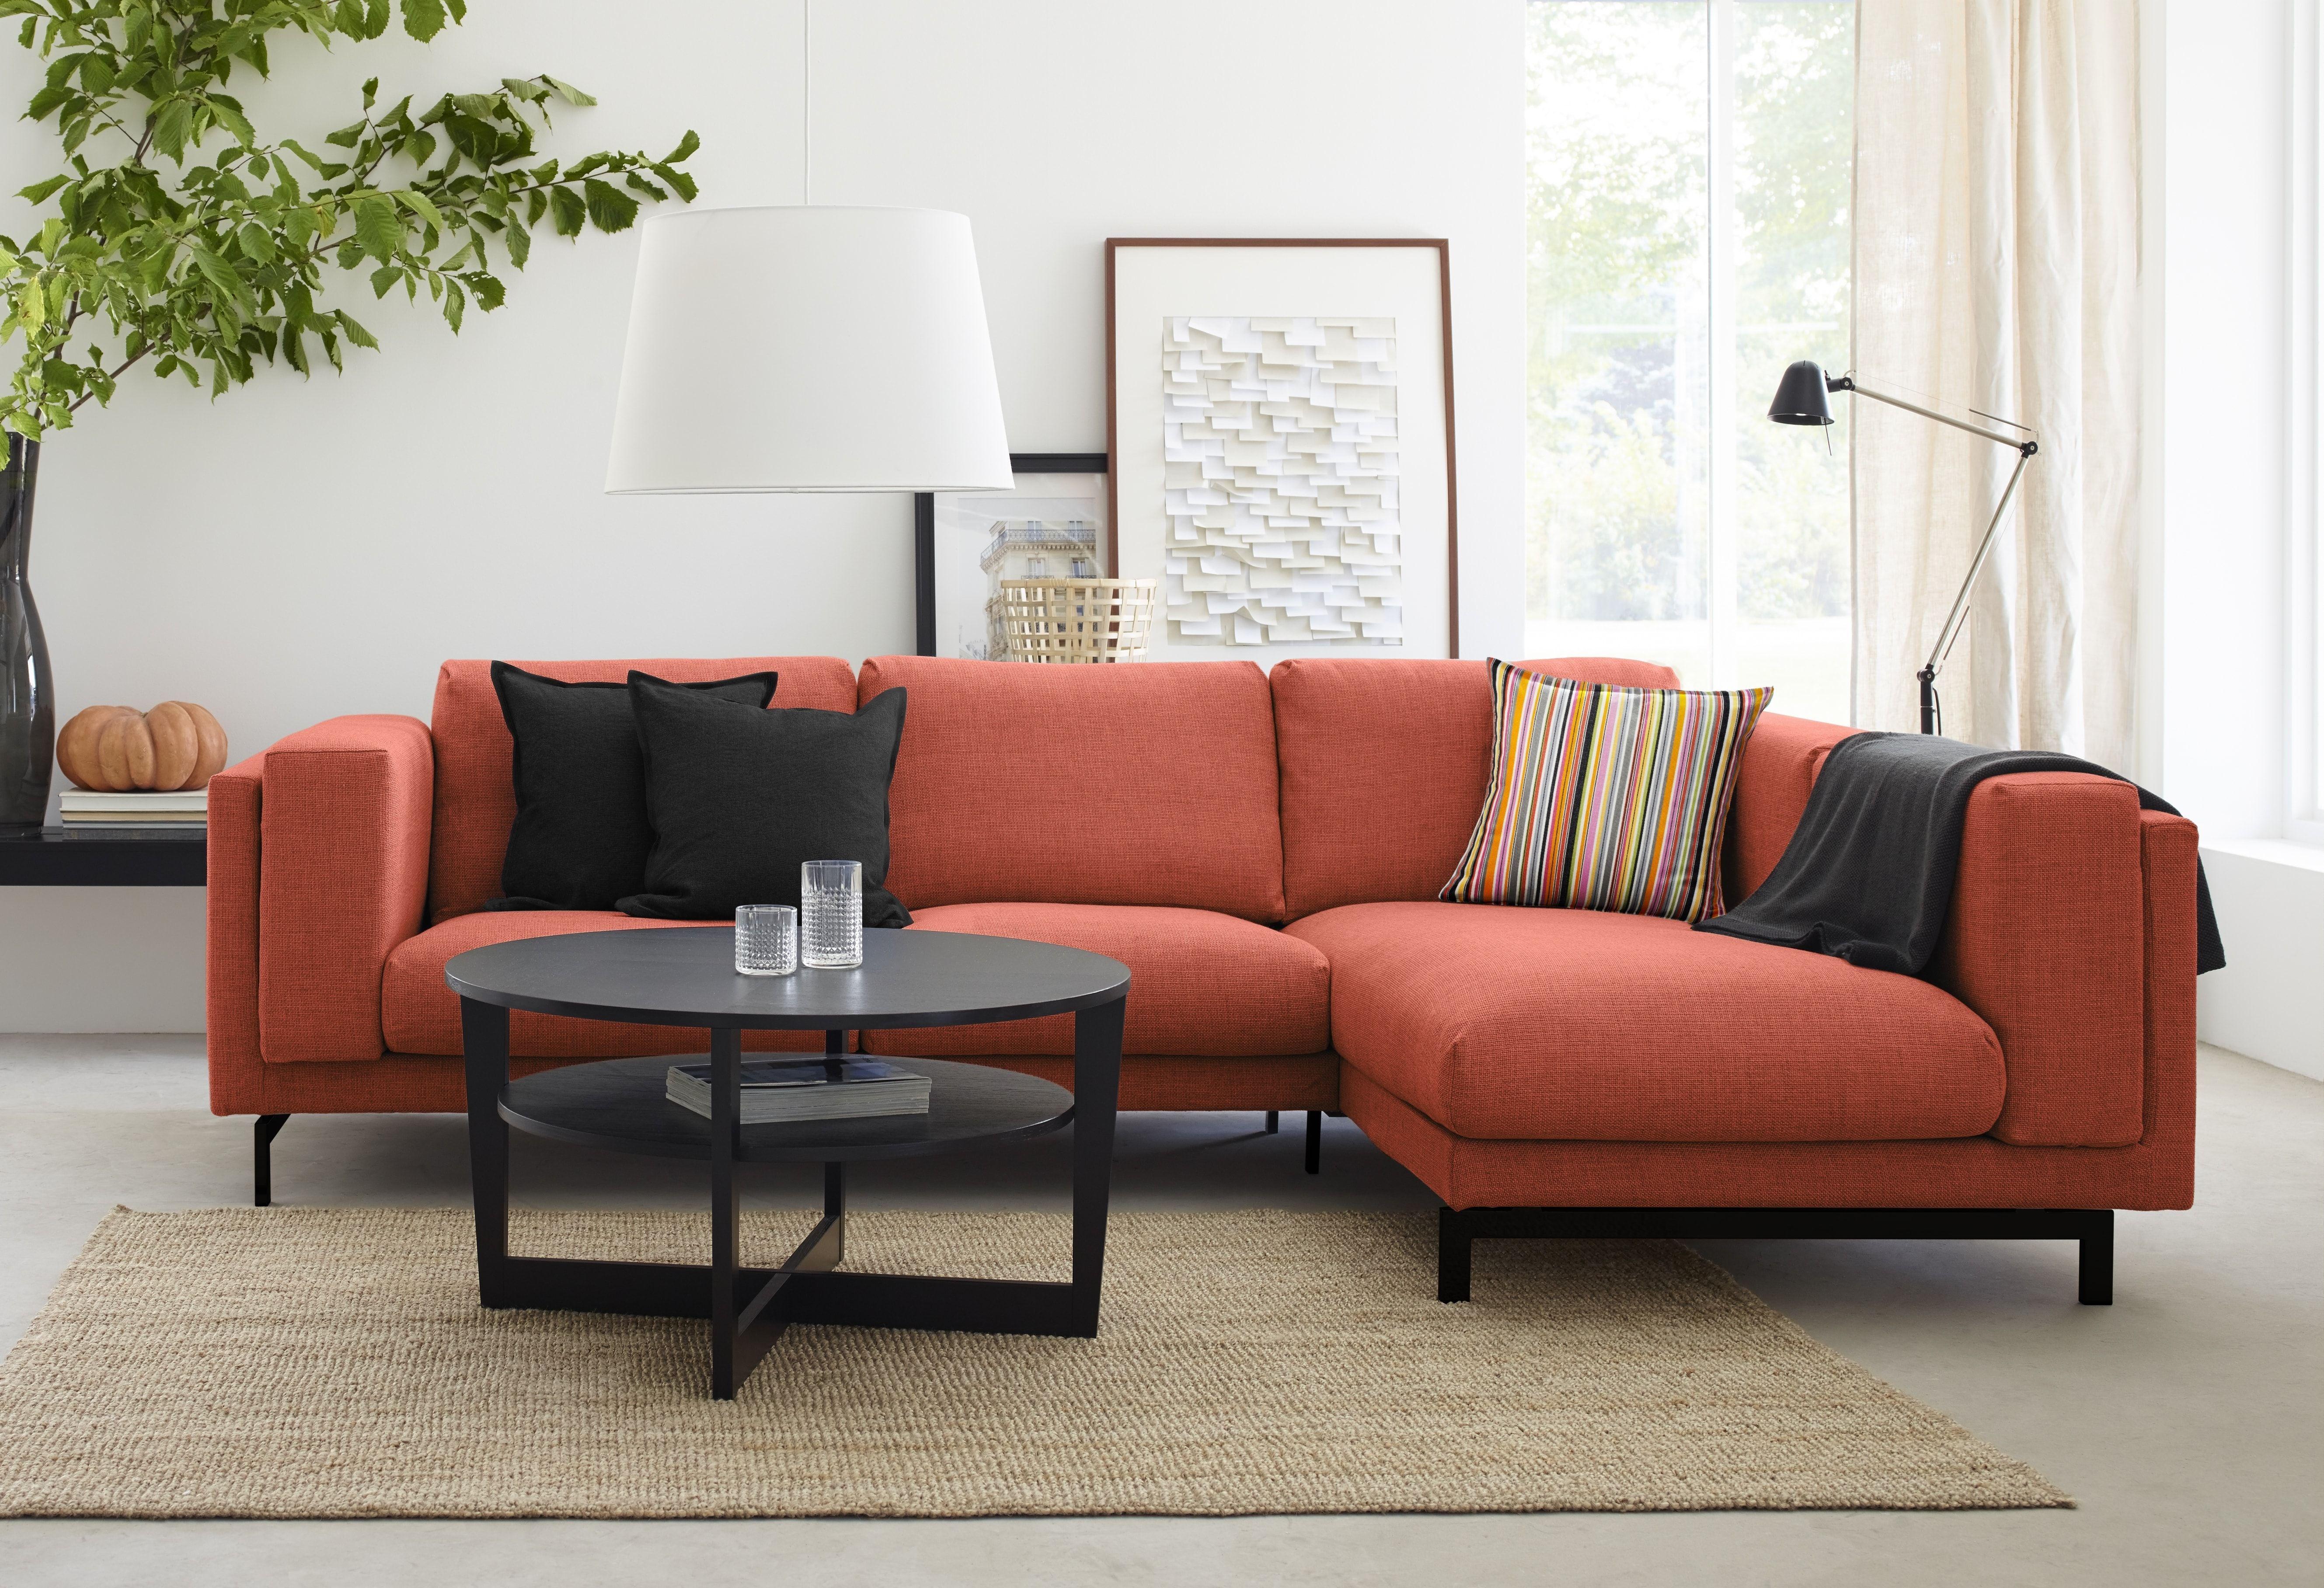 Ikea Canapé Angle Convertible Nouveau Photos 35 Impressionnant Canape 2 Places Meri Nne